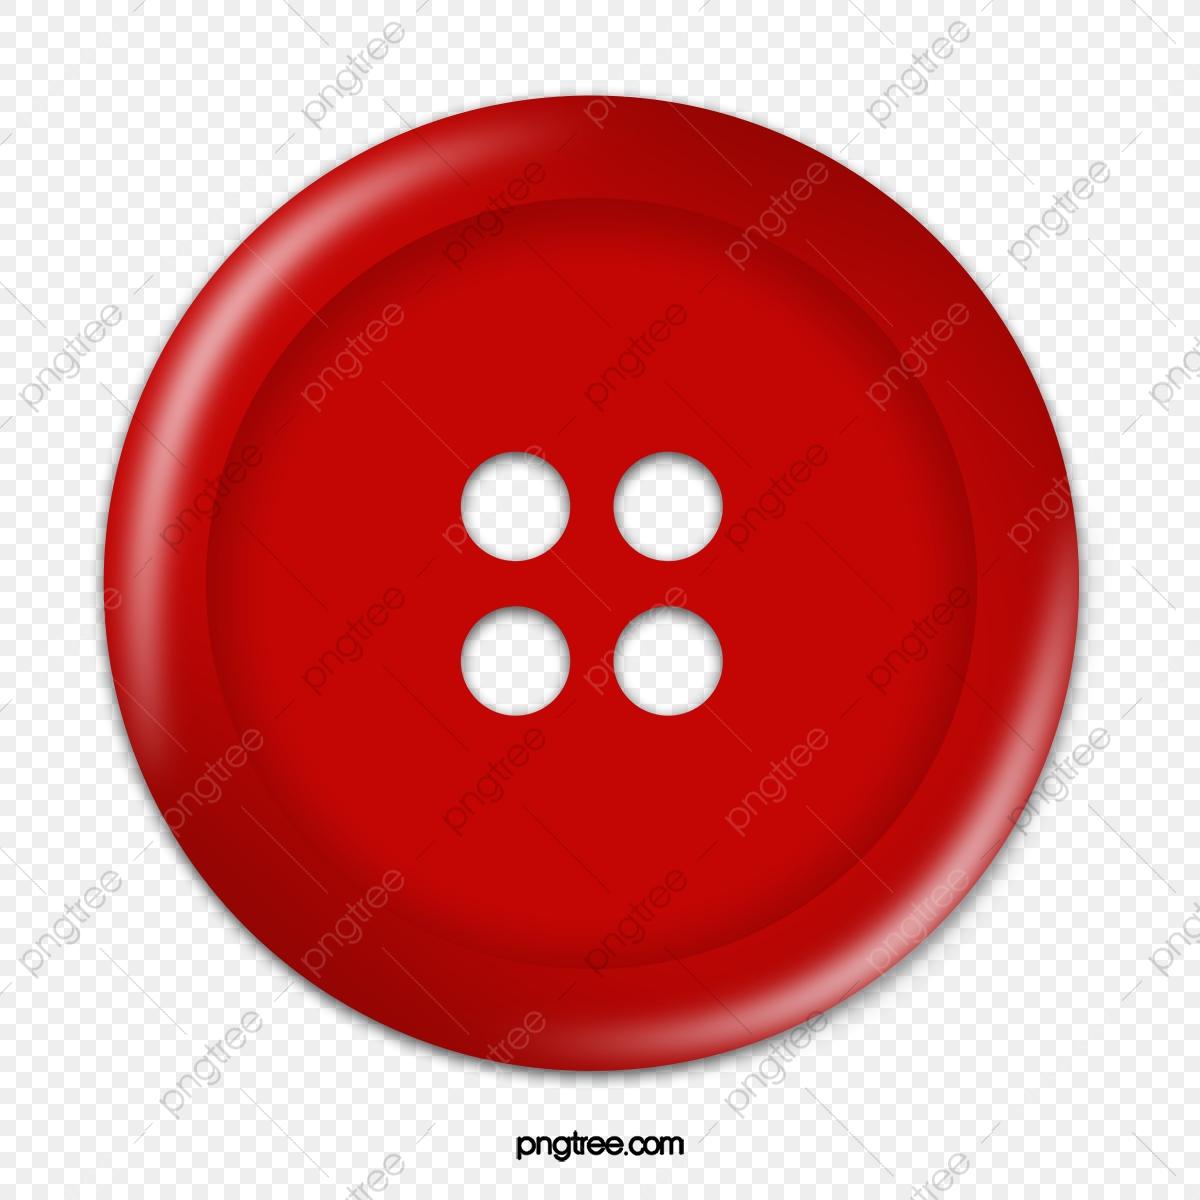 Red Button, Button Clipart, Button, Clothes Button PNG.